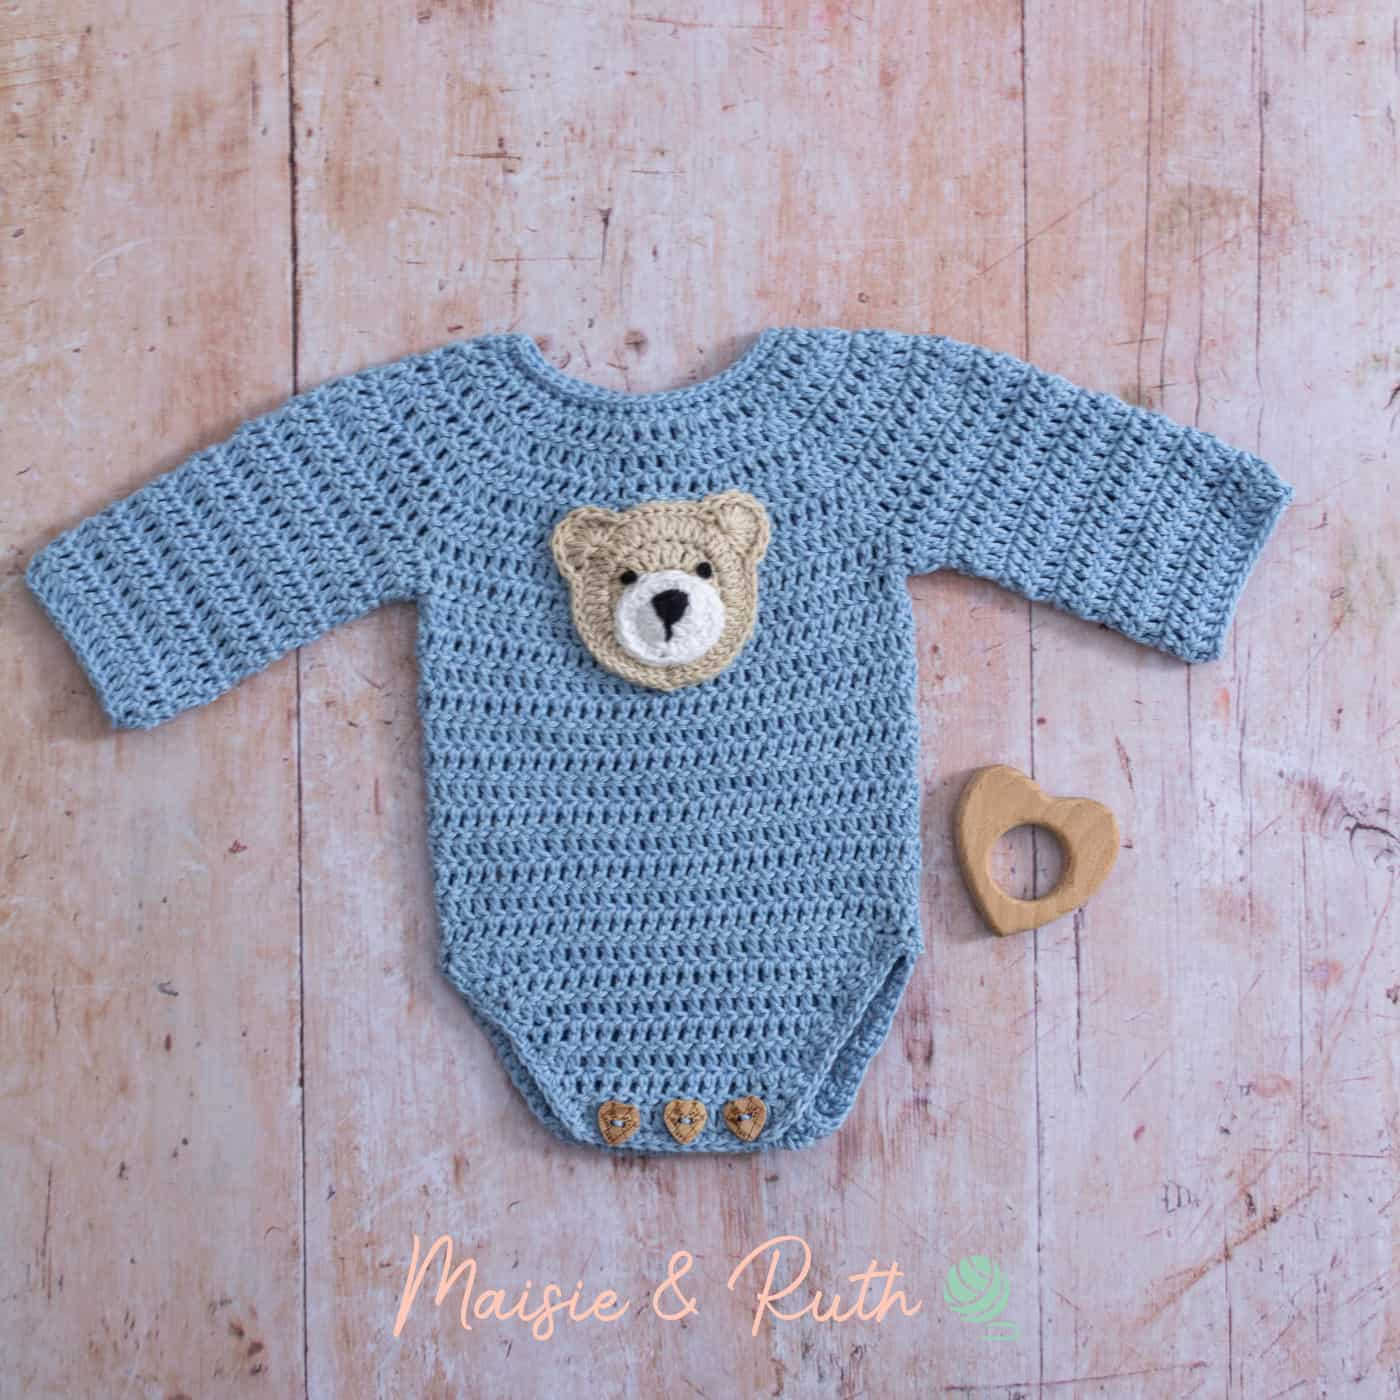 Crochet Baby Onesie Pattern with wooden heart